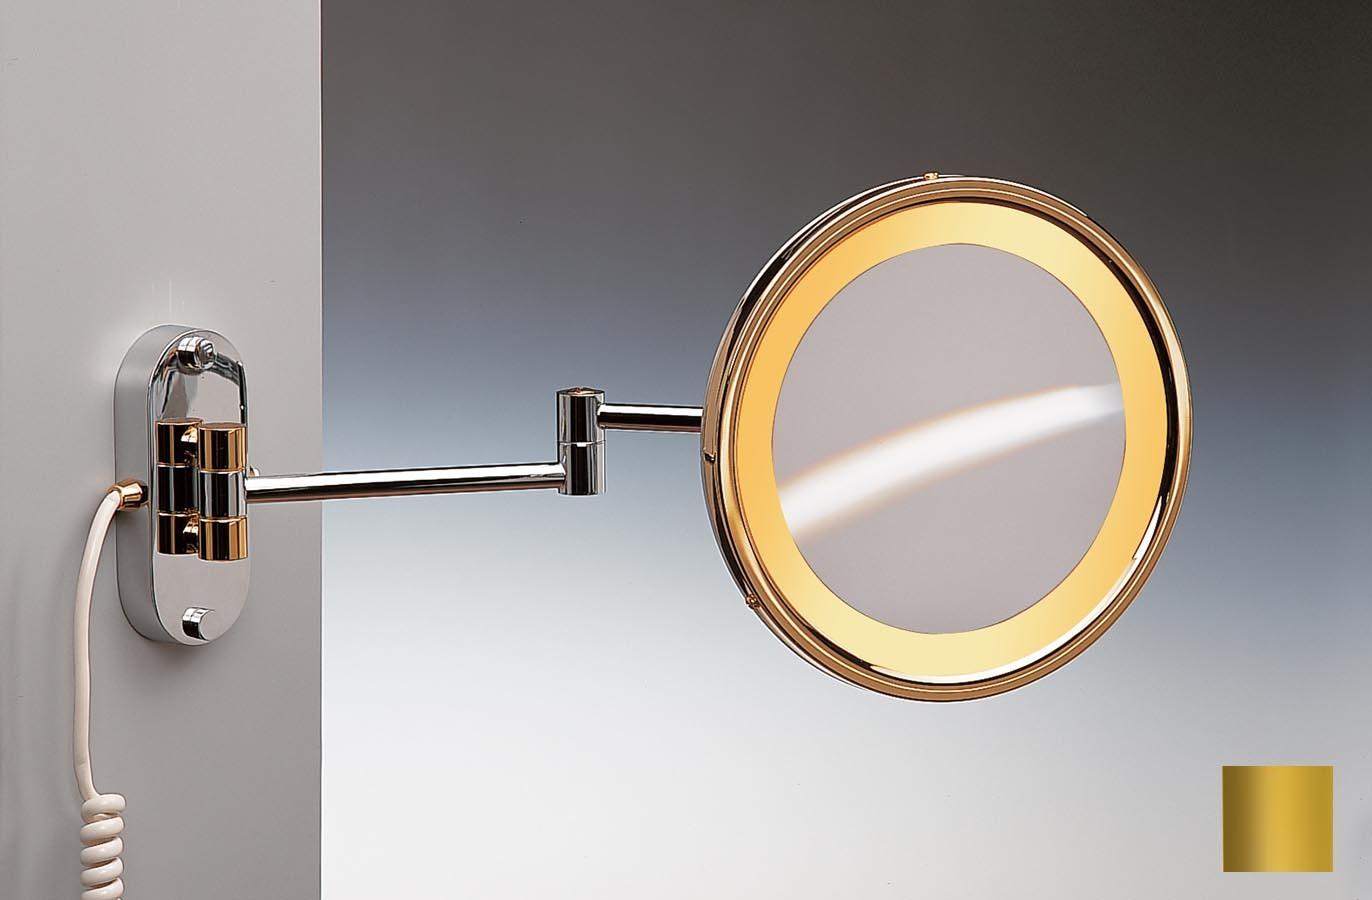 Зеркала Зеркало косметическое Windisch 99150O 3X elitnoe-zerkalo-kosmeticheskoe-99150o-3x-ot-windisch-ispaniya.jpg